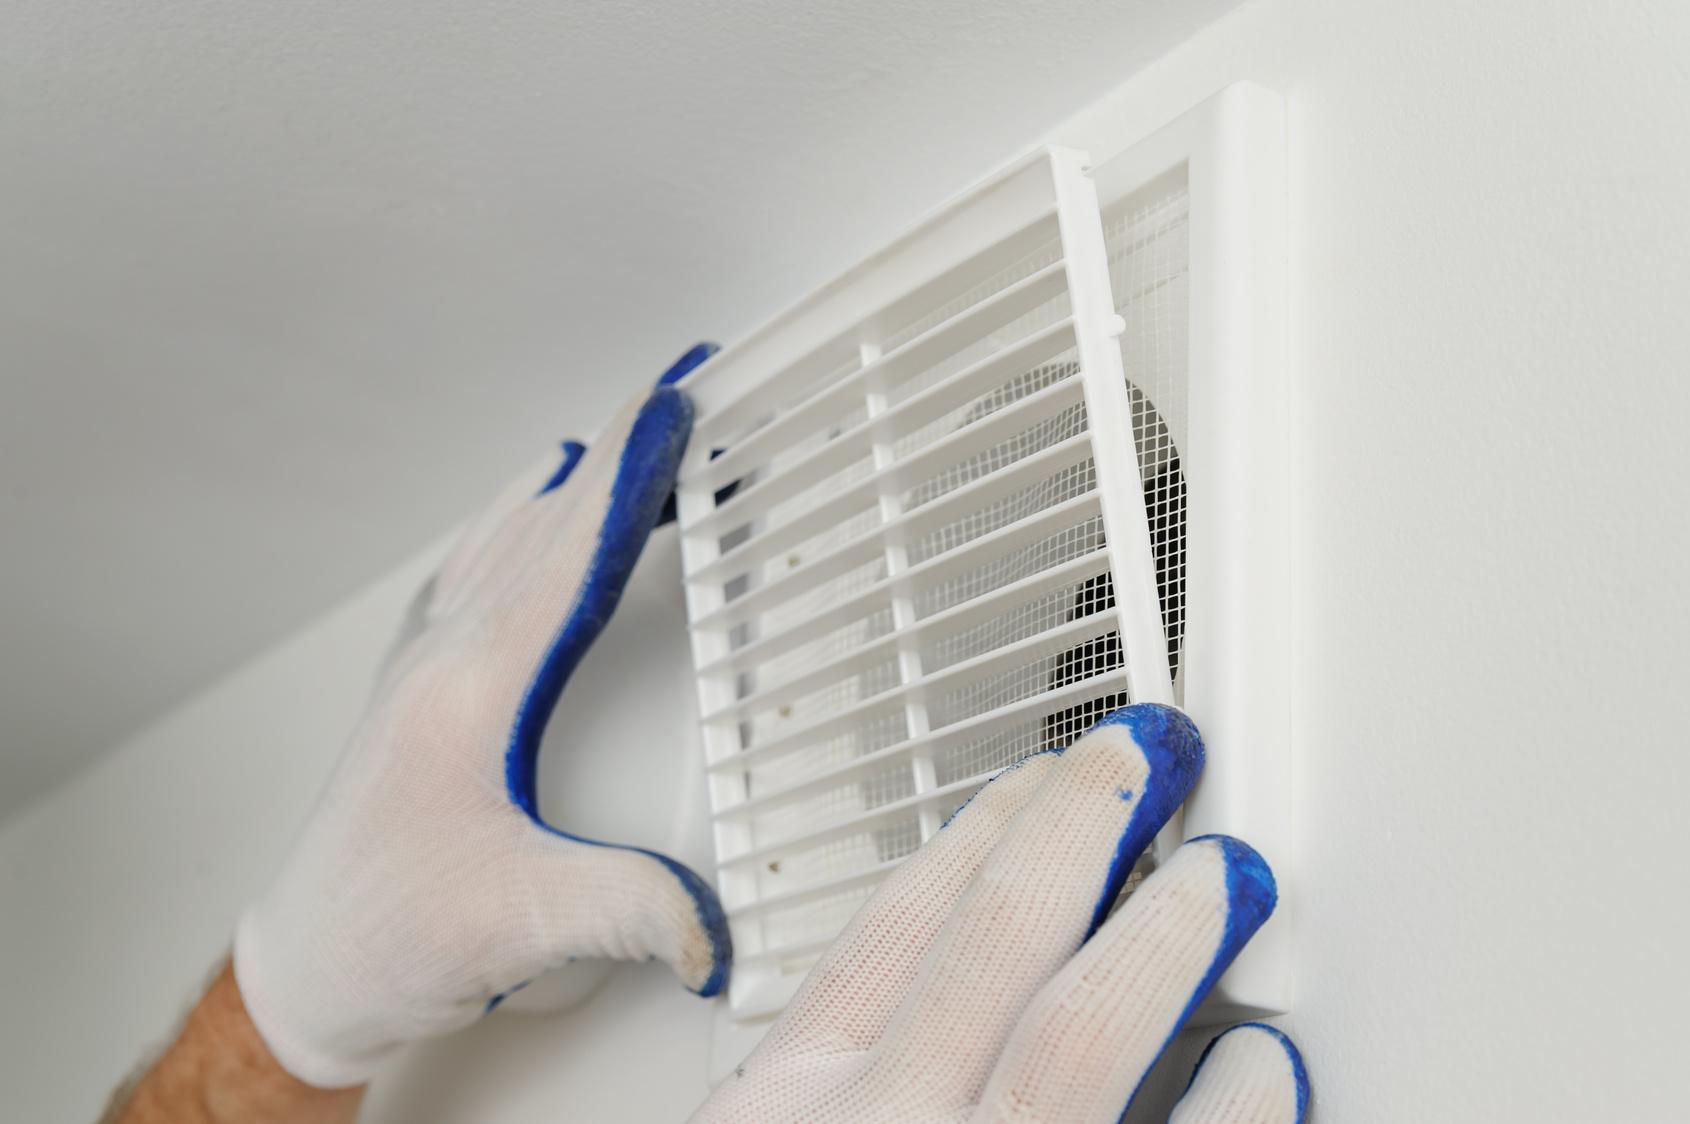 Full Size of Worker Installs Ventilation Grille. Küche Lüftung Küche